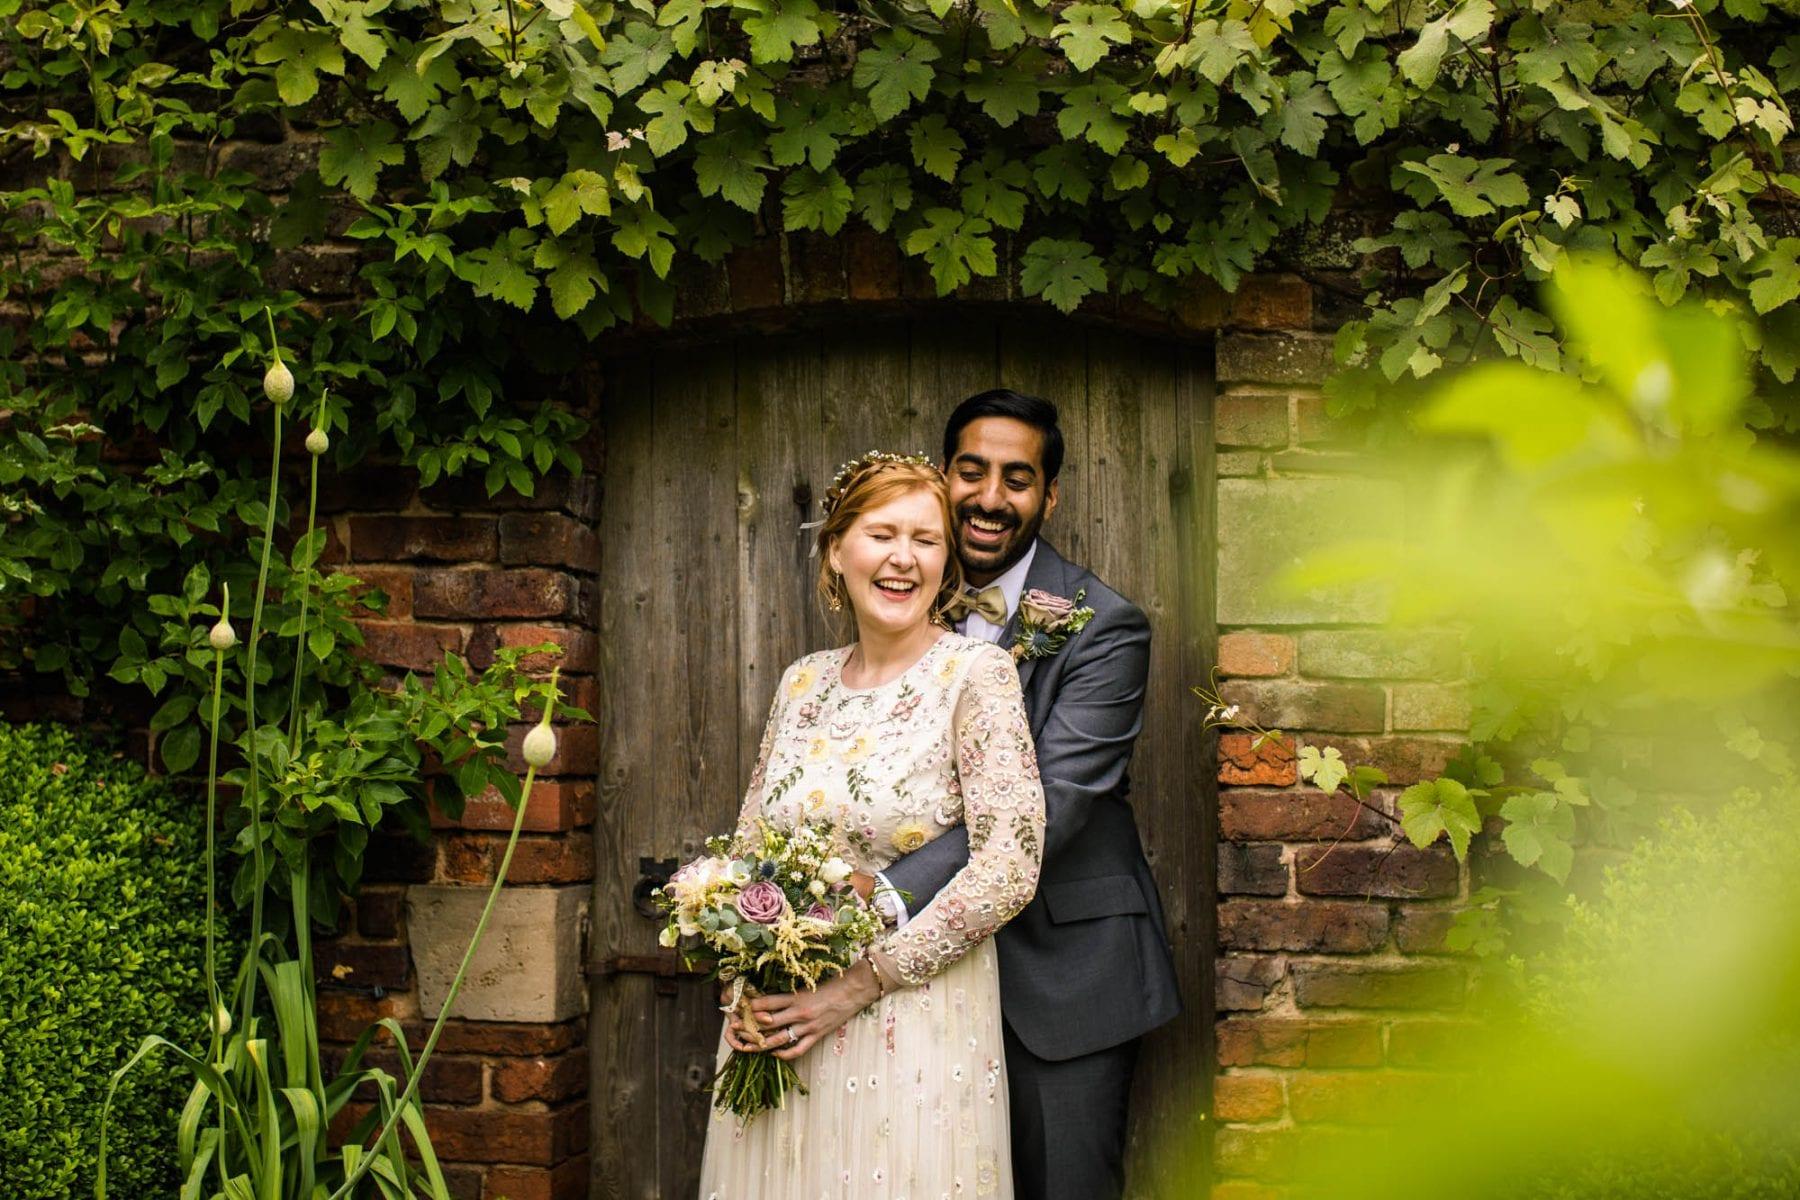 Pimhill Barn Weddings